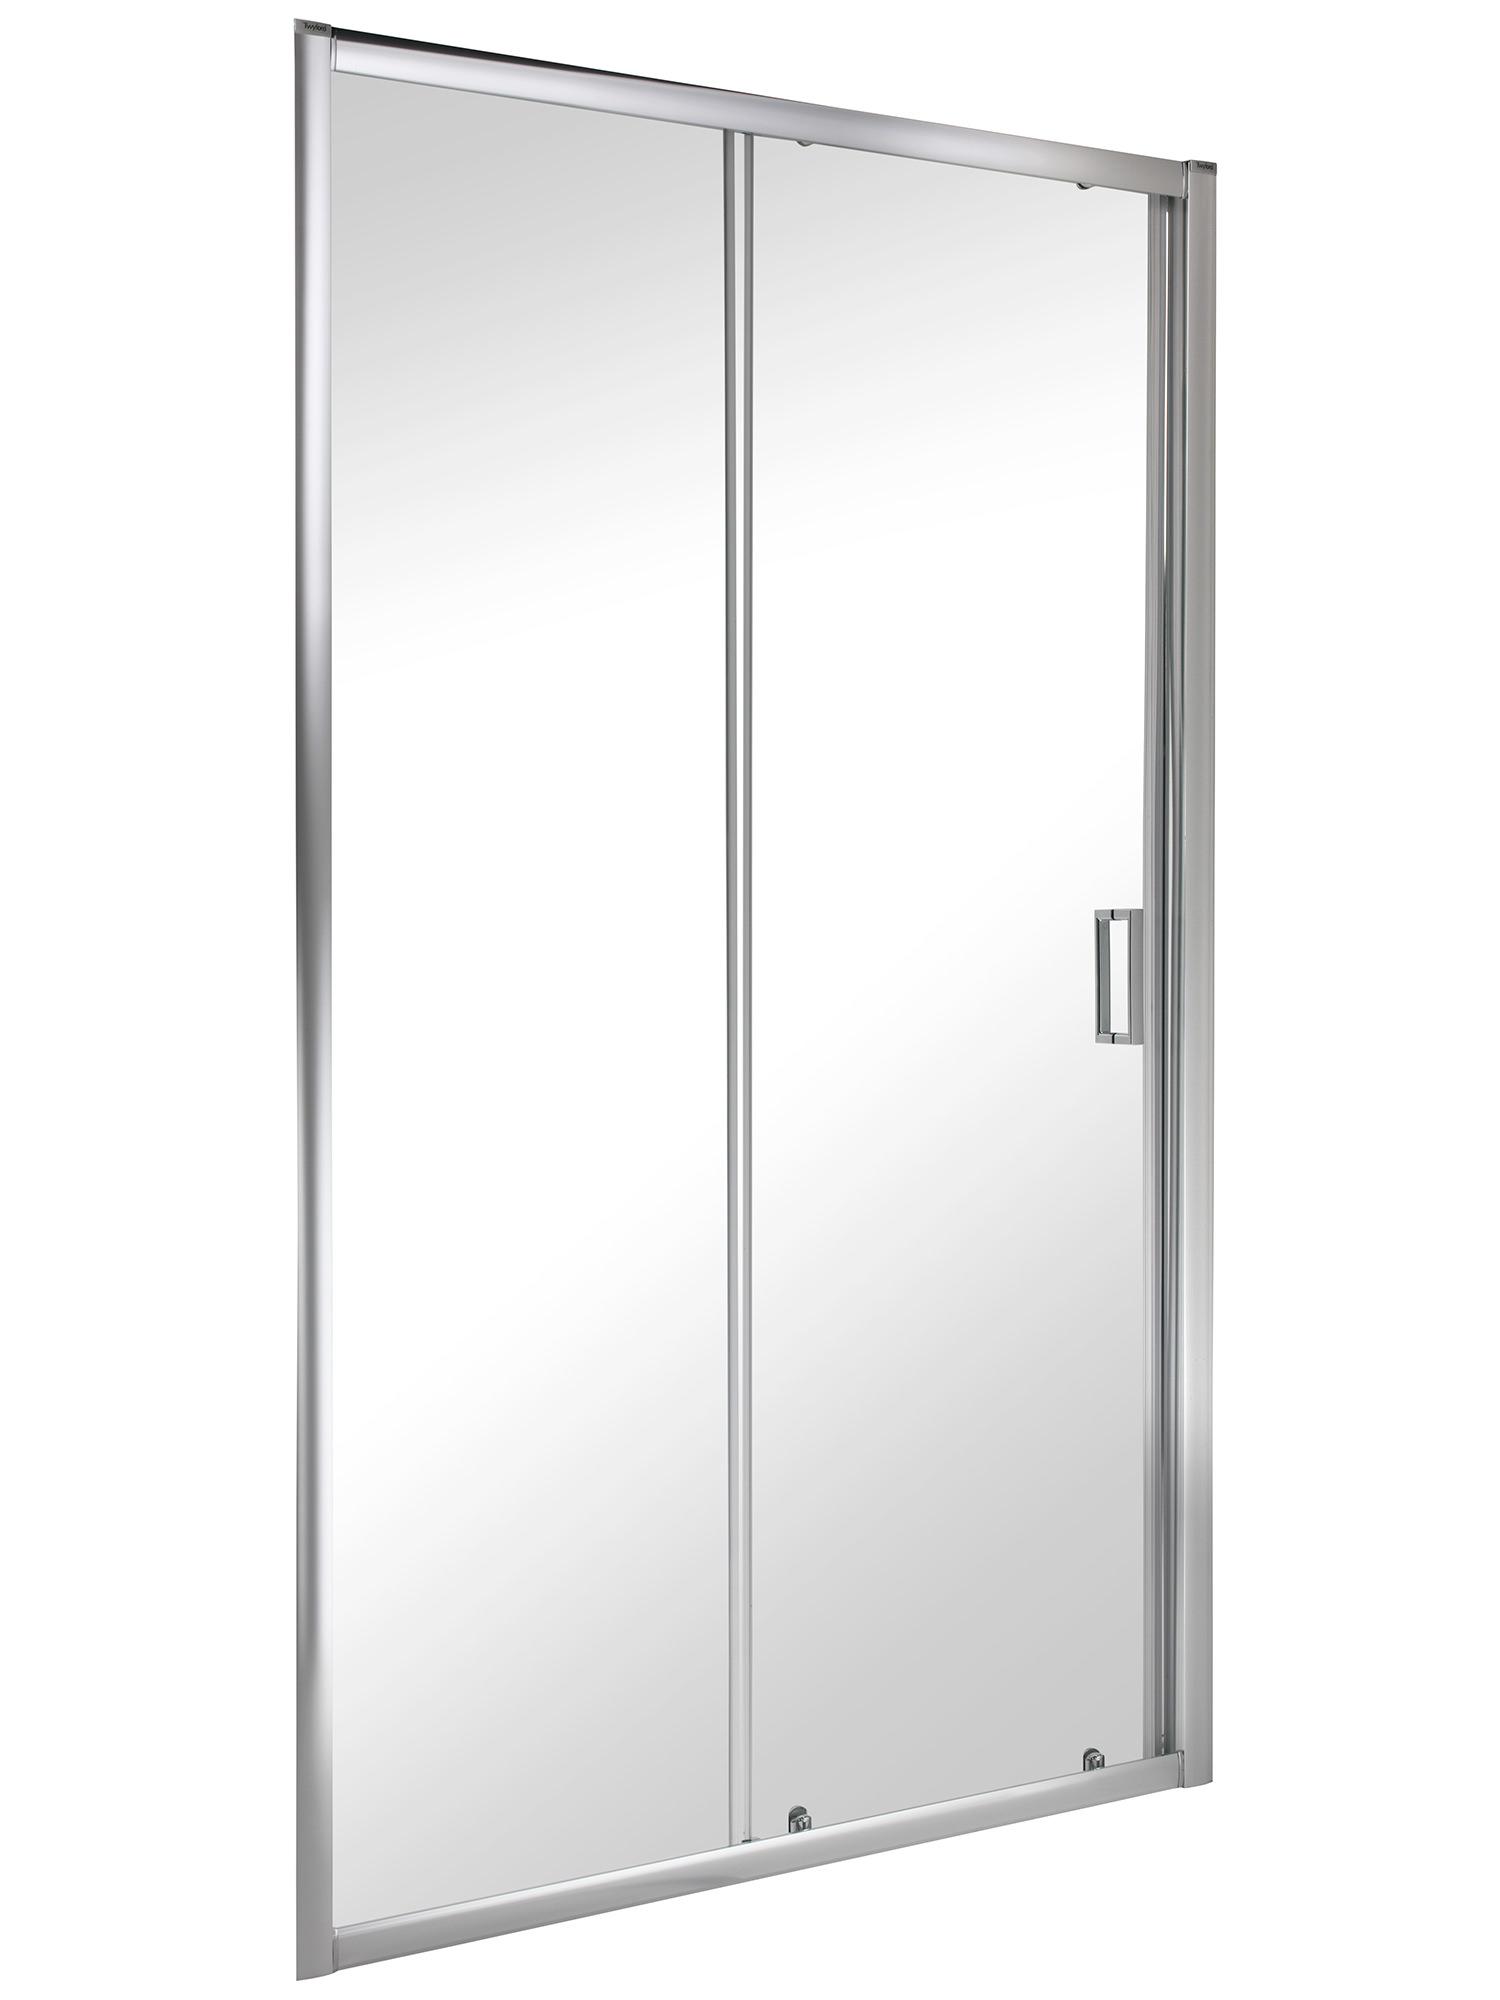 Twyford es200 1000mm sliding shower enclosure door for 1000mm sliding shower door